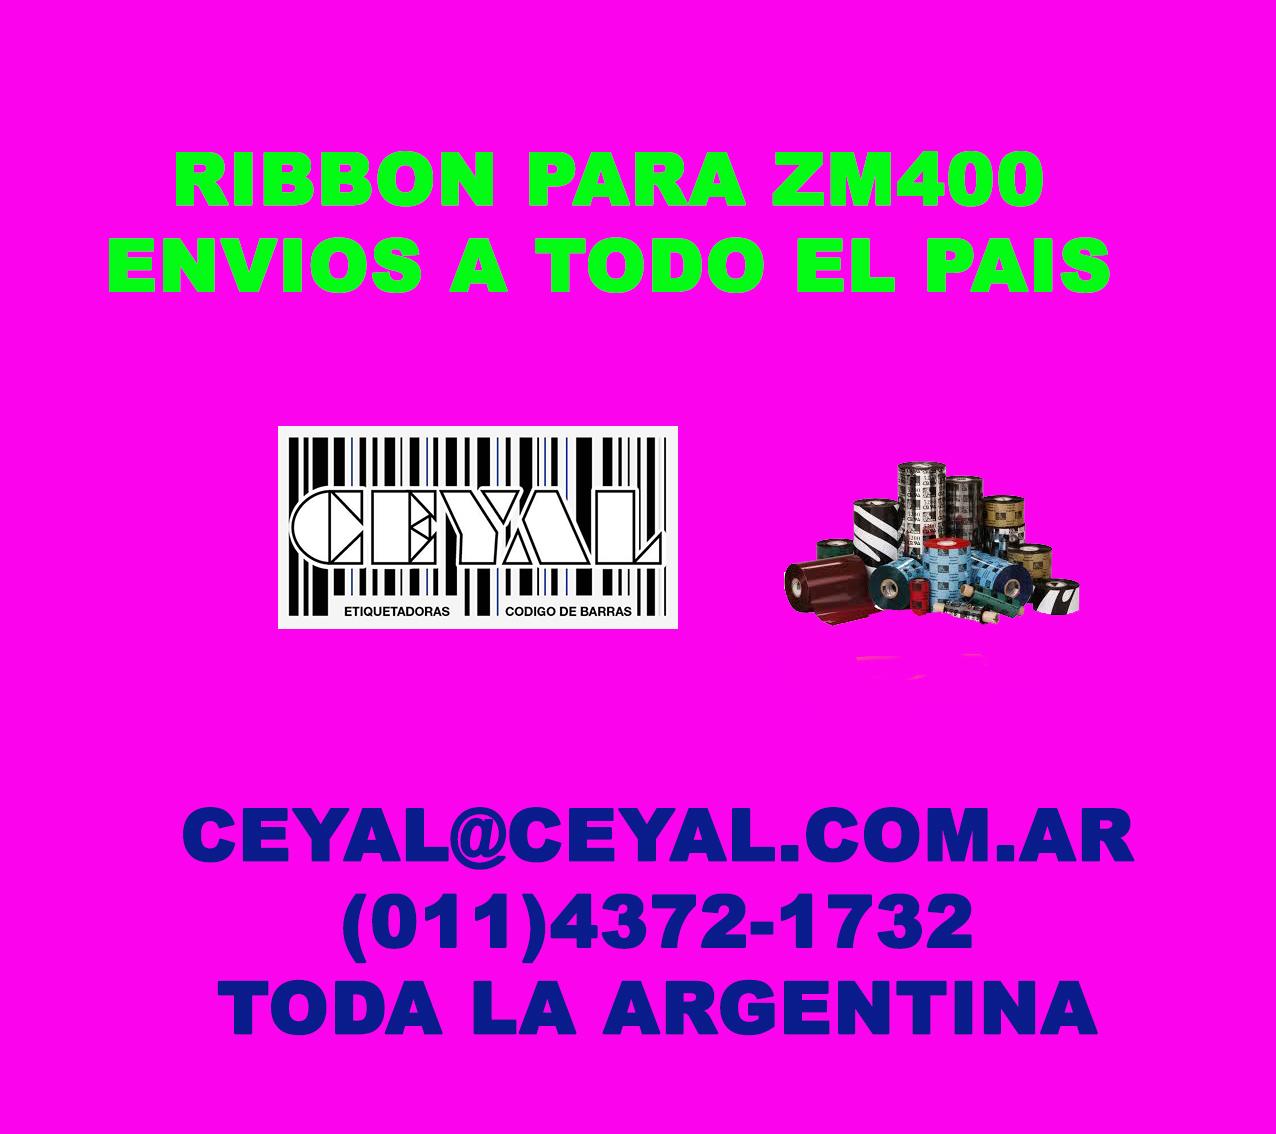 Fabrica de etiquetas autoadhesivas Ropa distribuyen Argentina